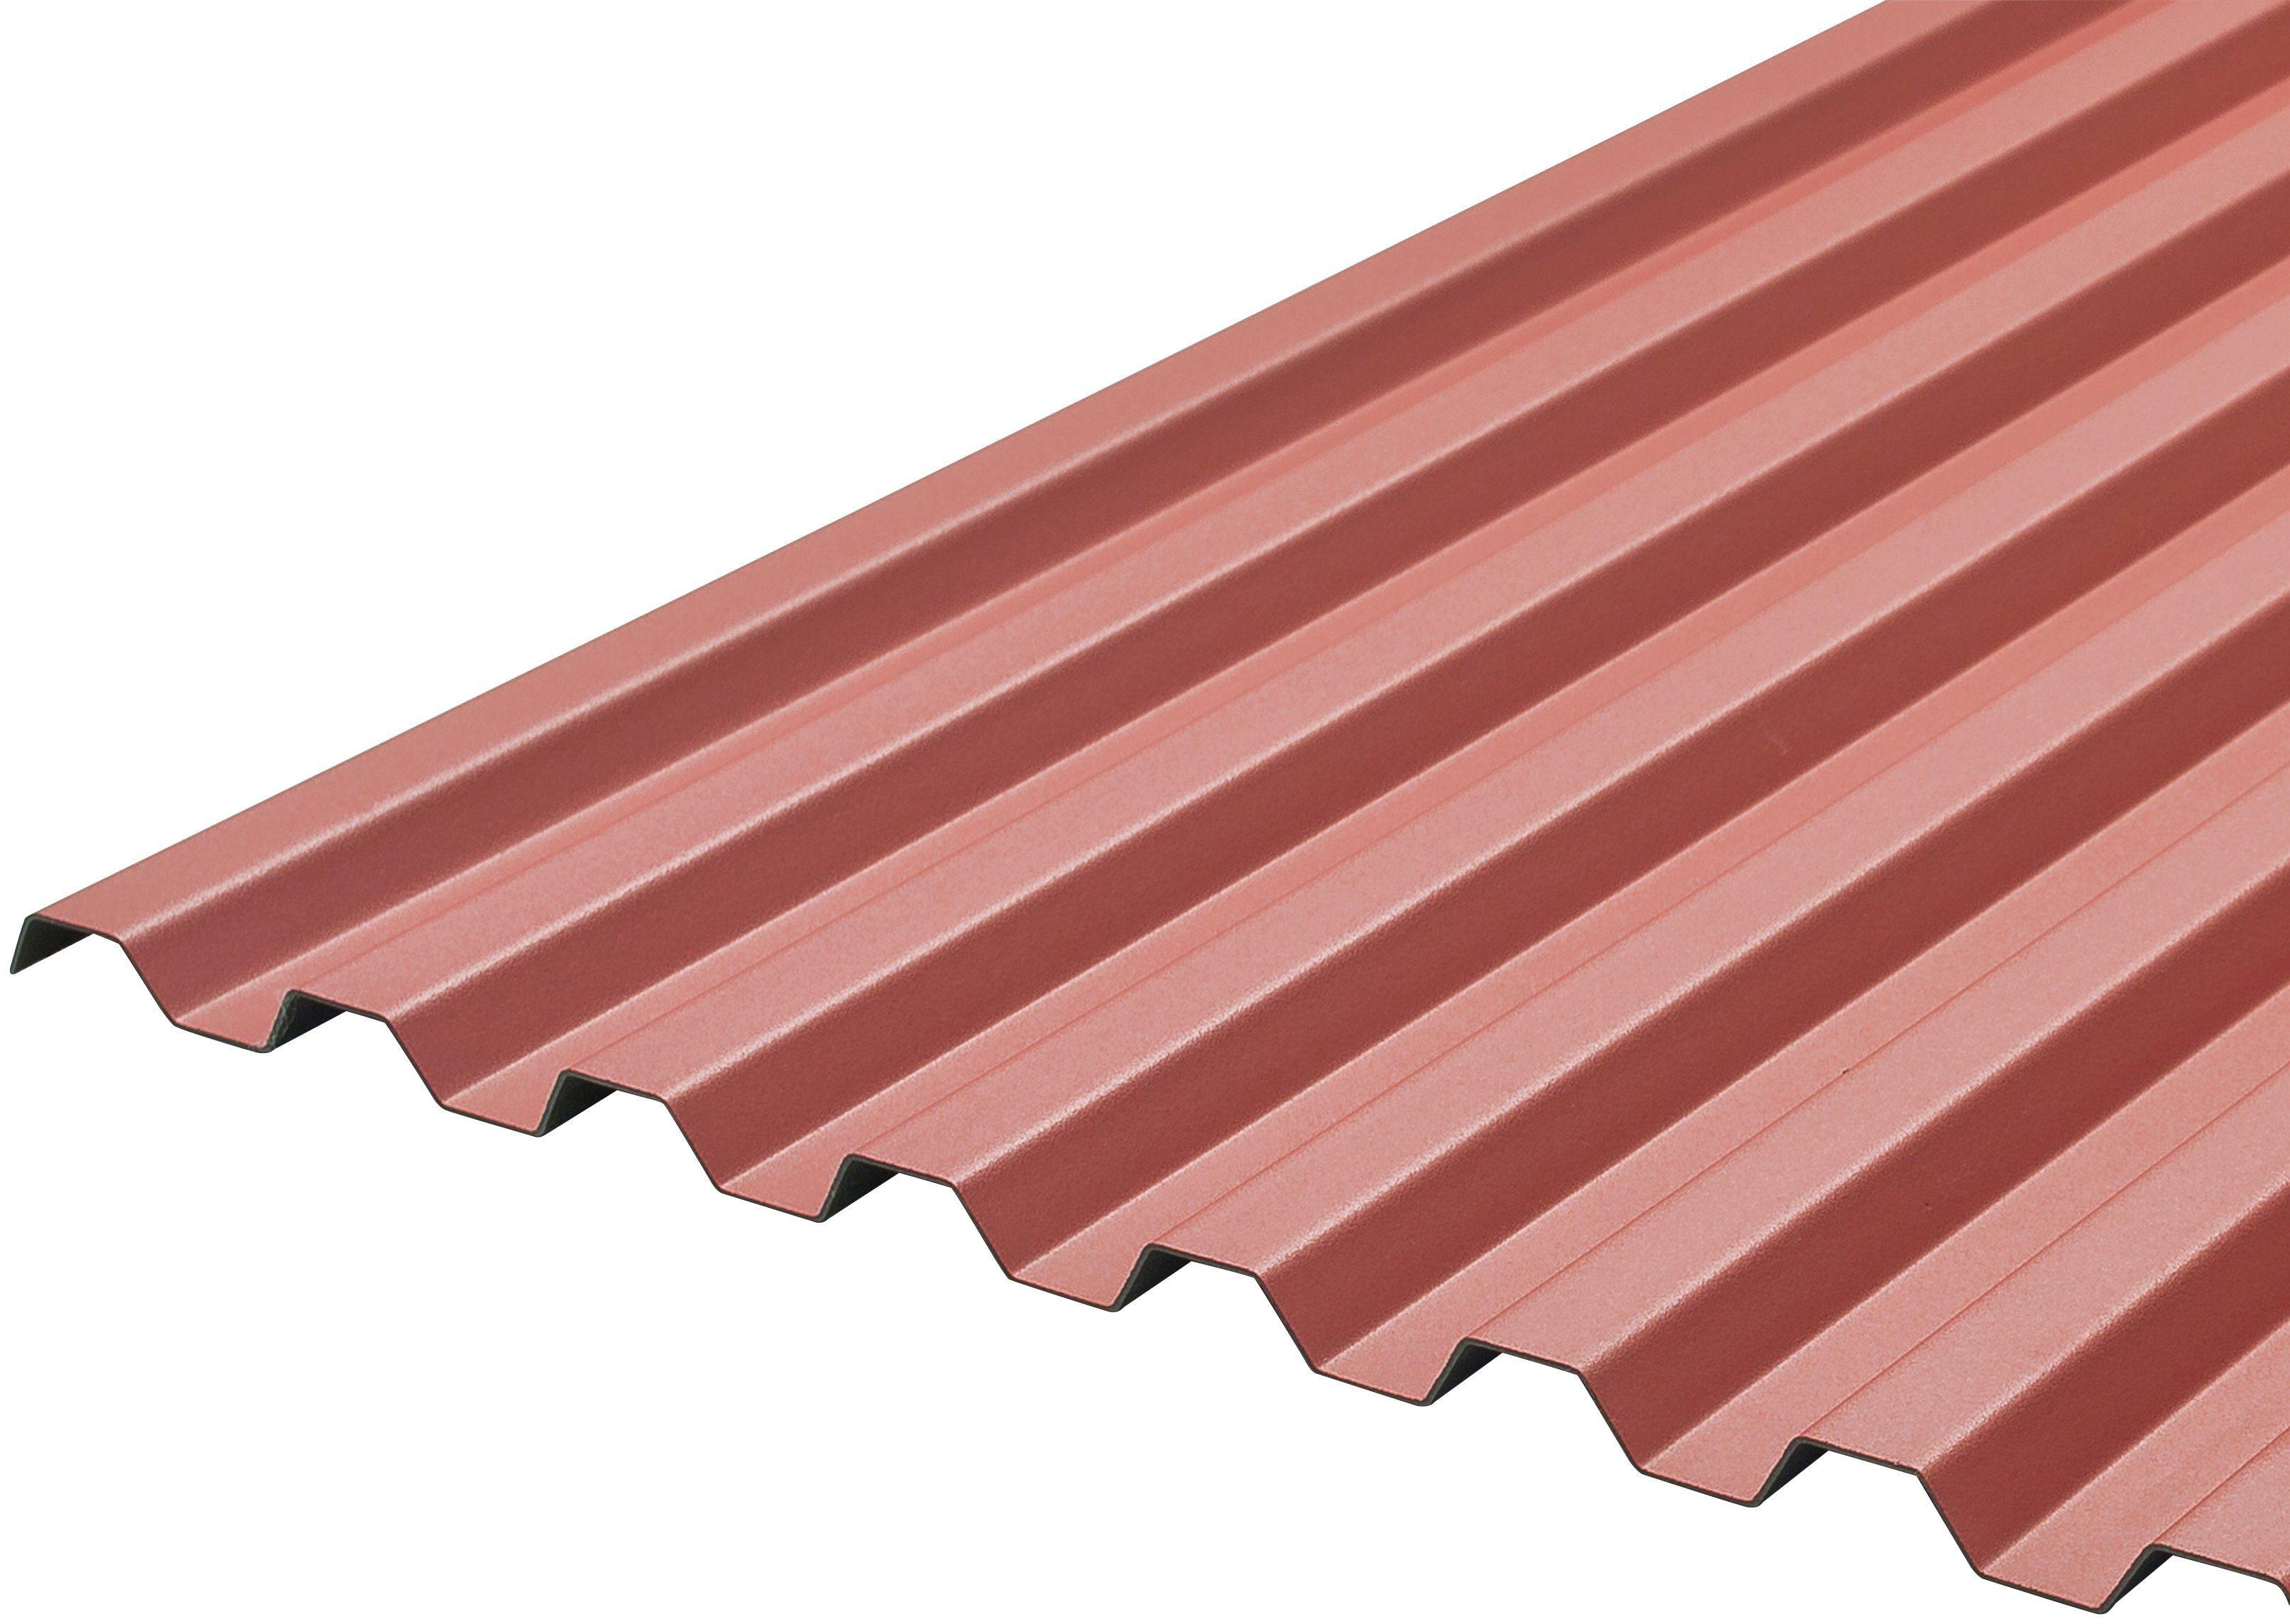 Wellplatte »WSP 70/18 trapez«, rot, 9,6 m², inkl. Befestigung